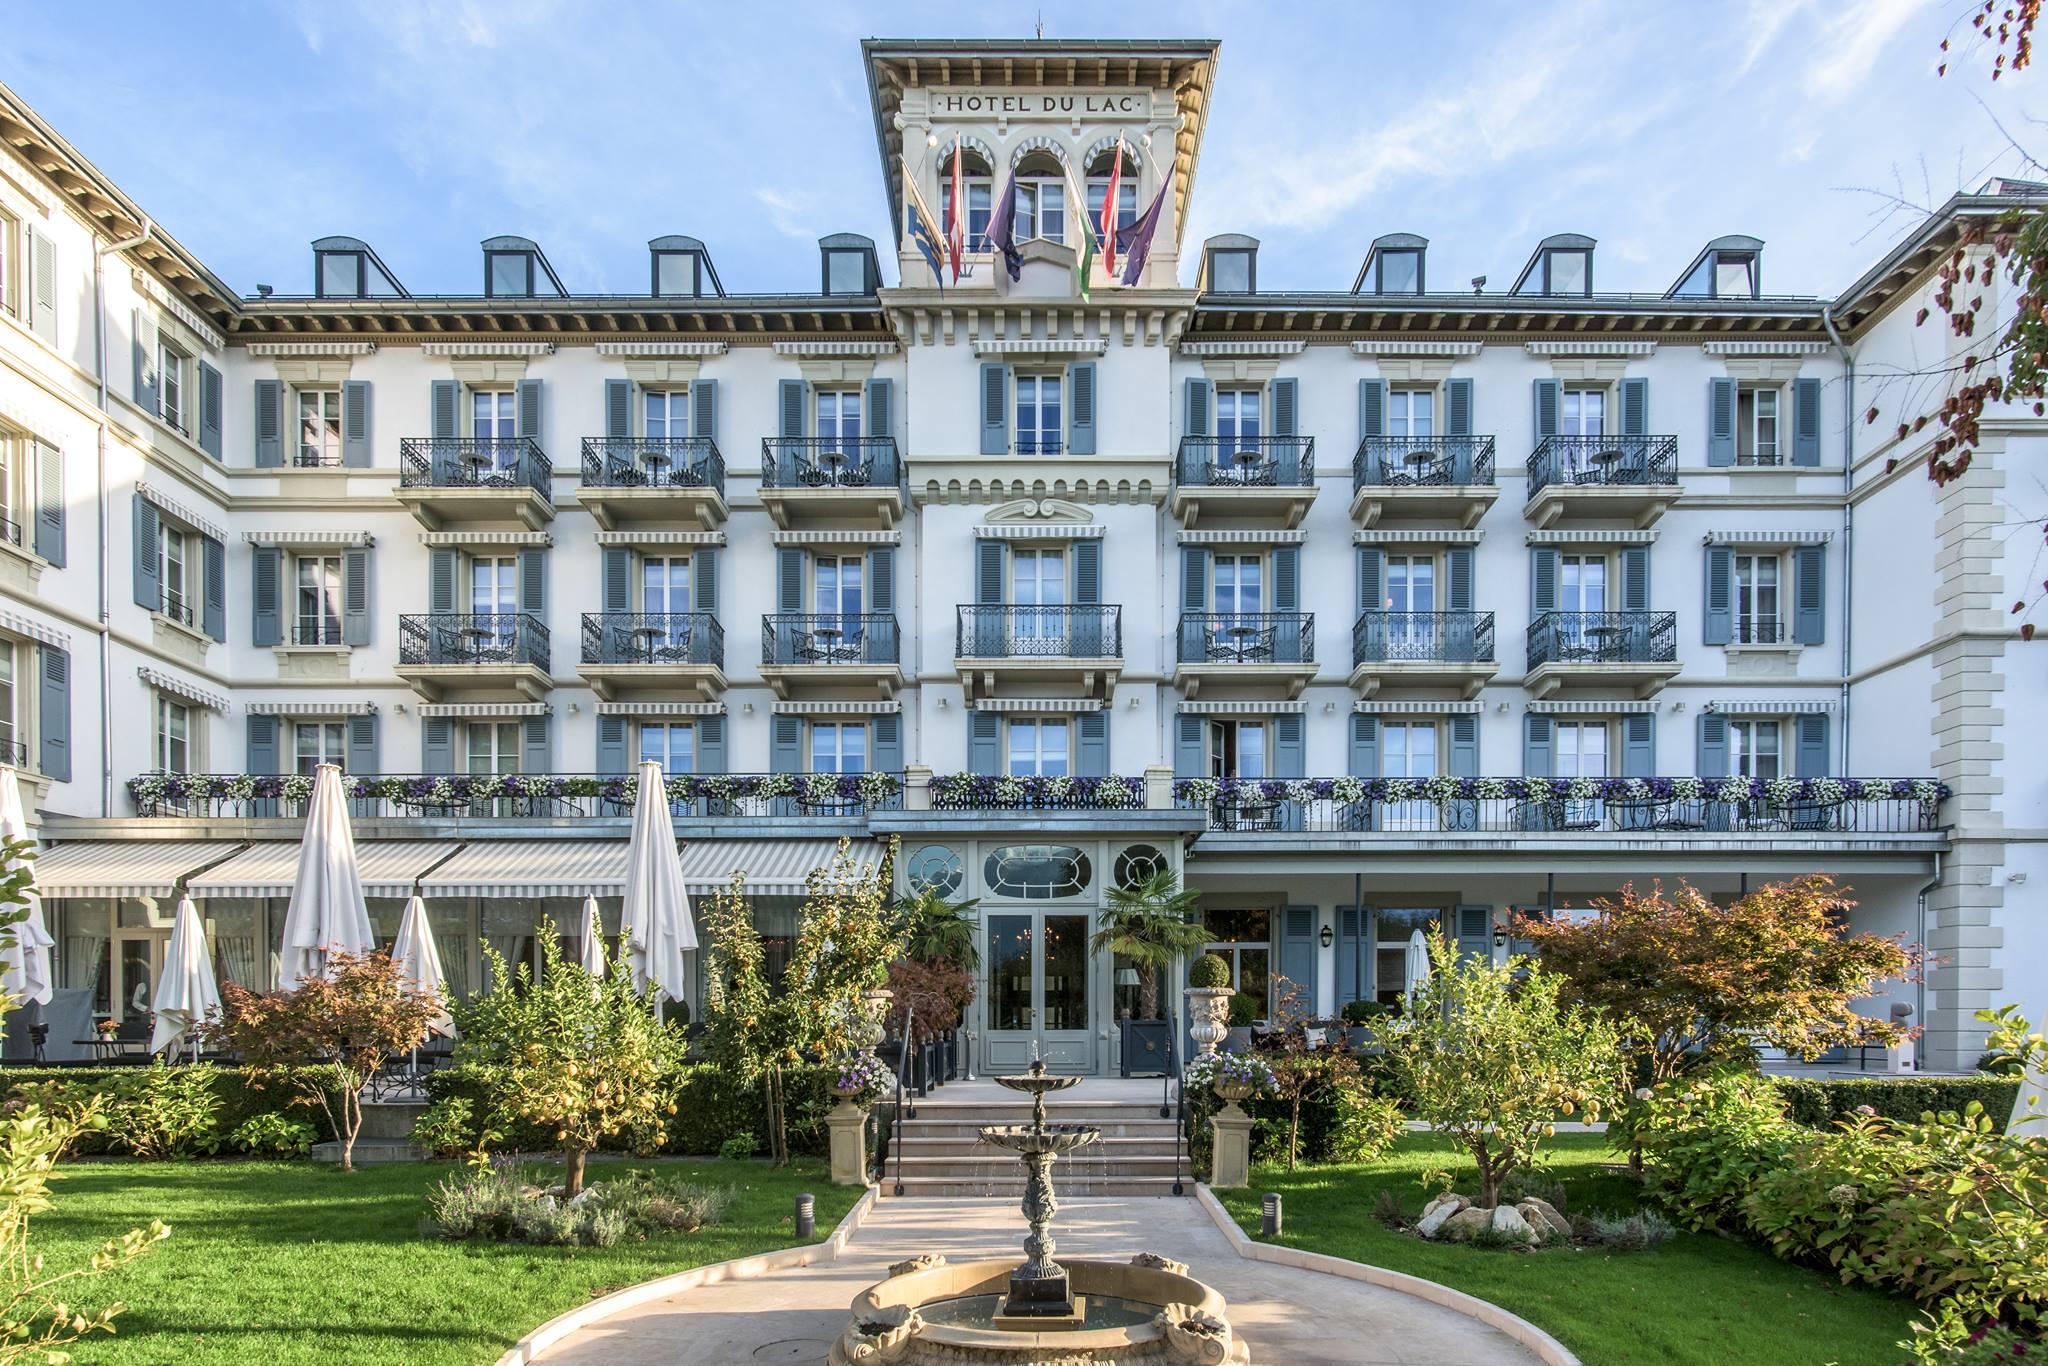 S.Pellegrino Sapori Ticino 2020 Grand Hotel du Lac Vevey